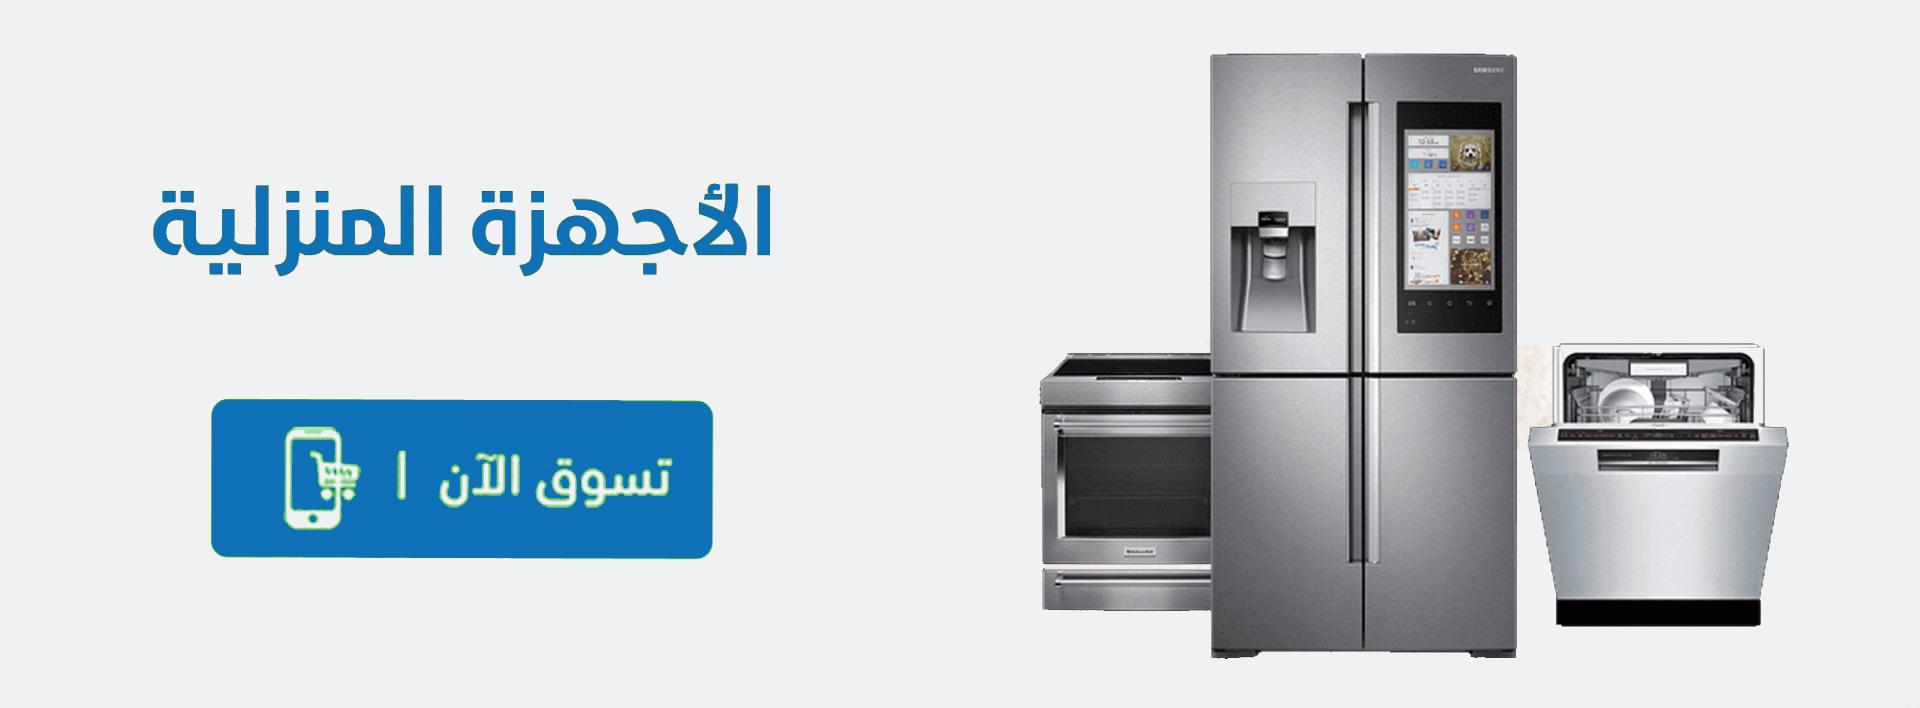 Promotion3 Rabi3 & Saif